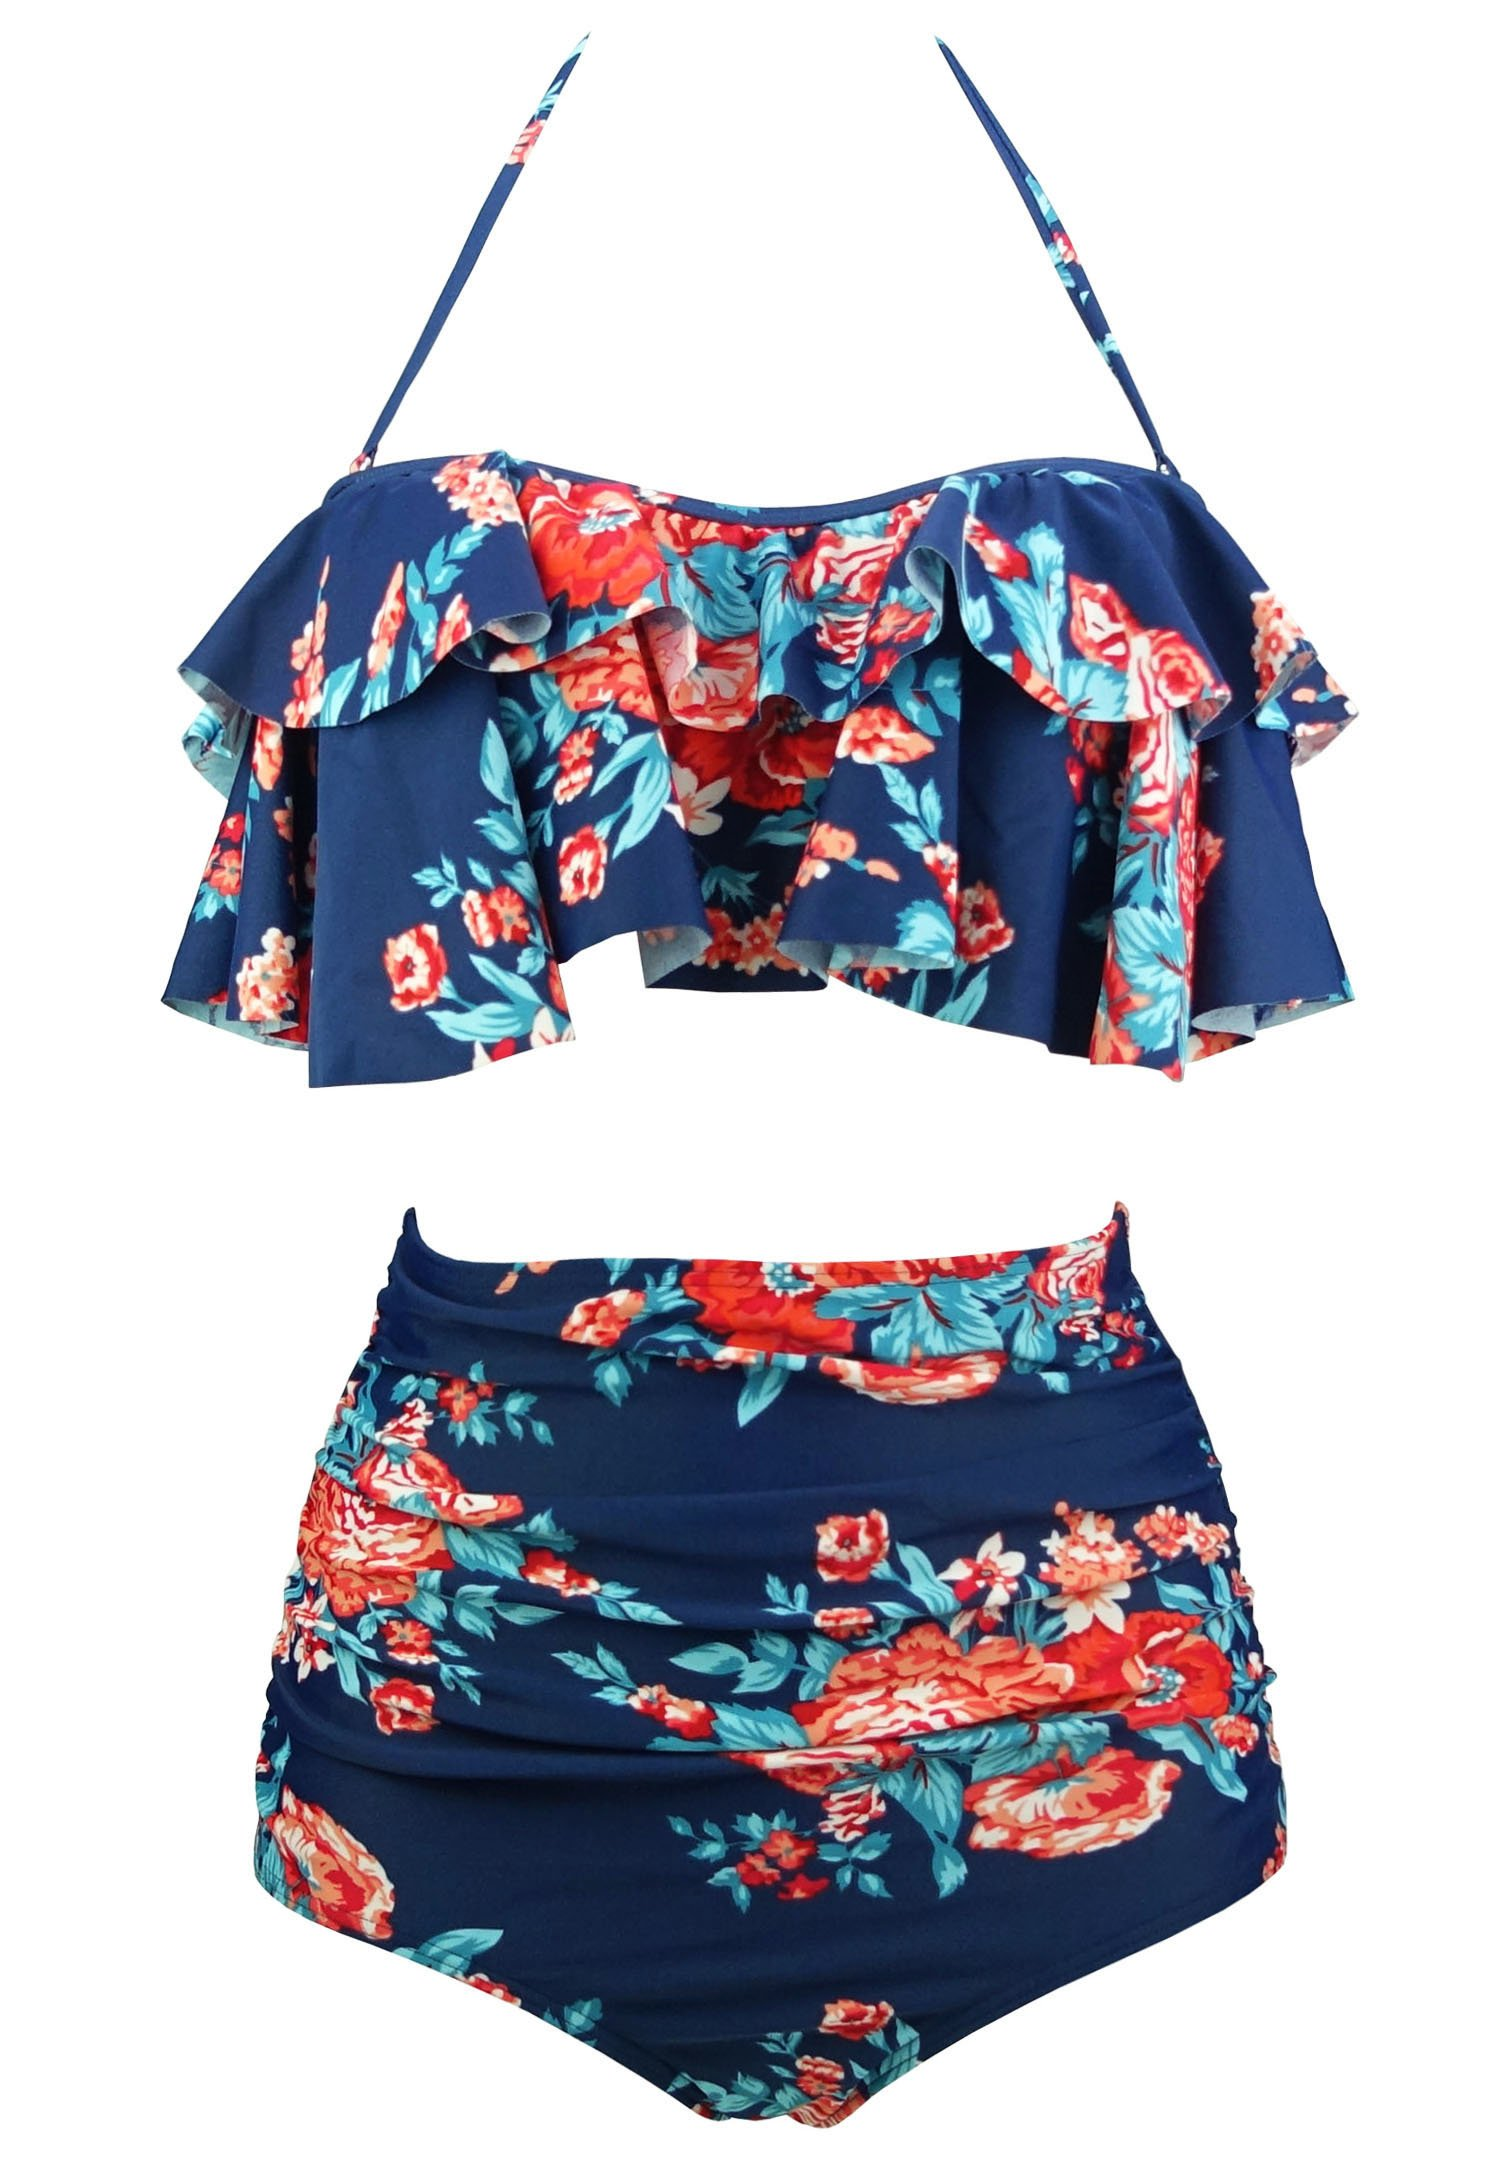 aedcdb9a5a Galleon - COCOSHIP Red Pink   Navy Blue Antigua Floral Retro Boho Flounce  Falbala High Waist Bikini Set Chic Swimsuit Bathing Suit M(FBA)